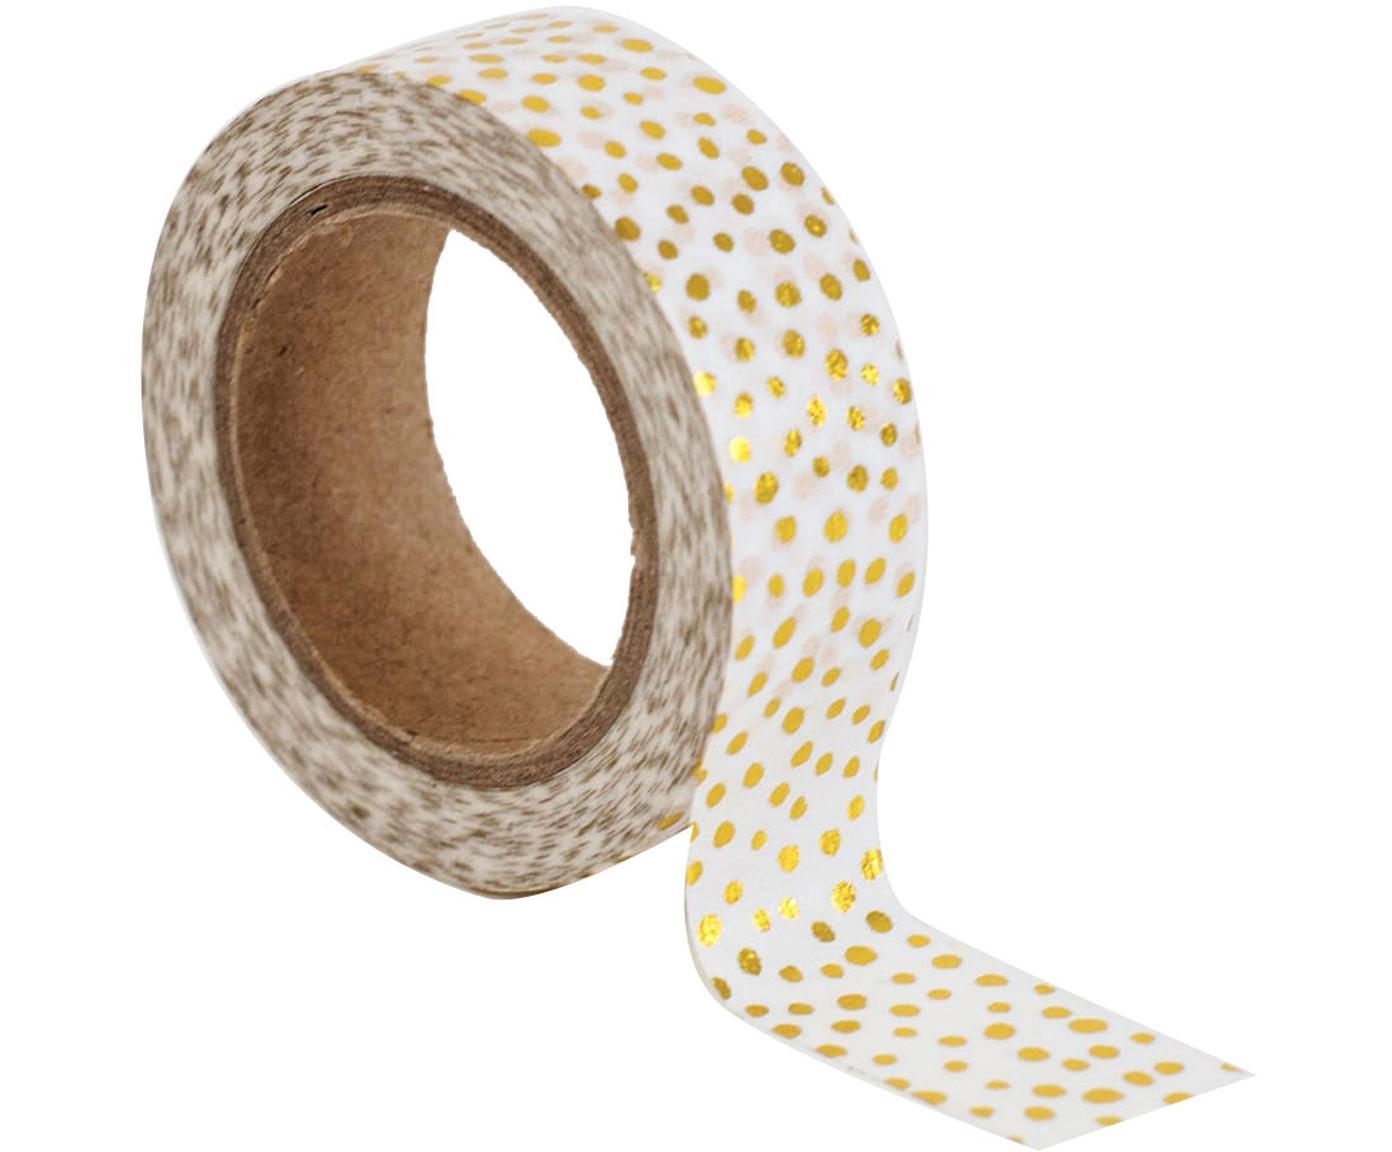 Plakband Dotty, 3 stuks, Kunststof, Wit, goudkleurig, L 1000 cm